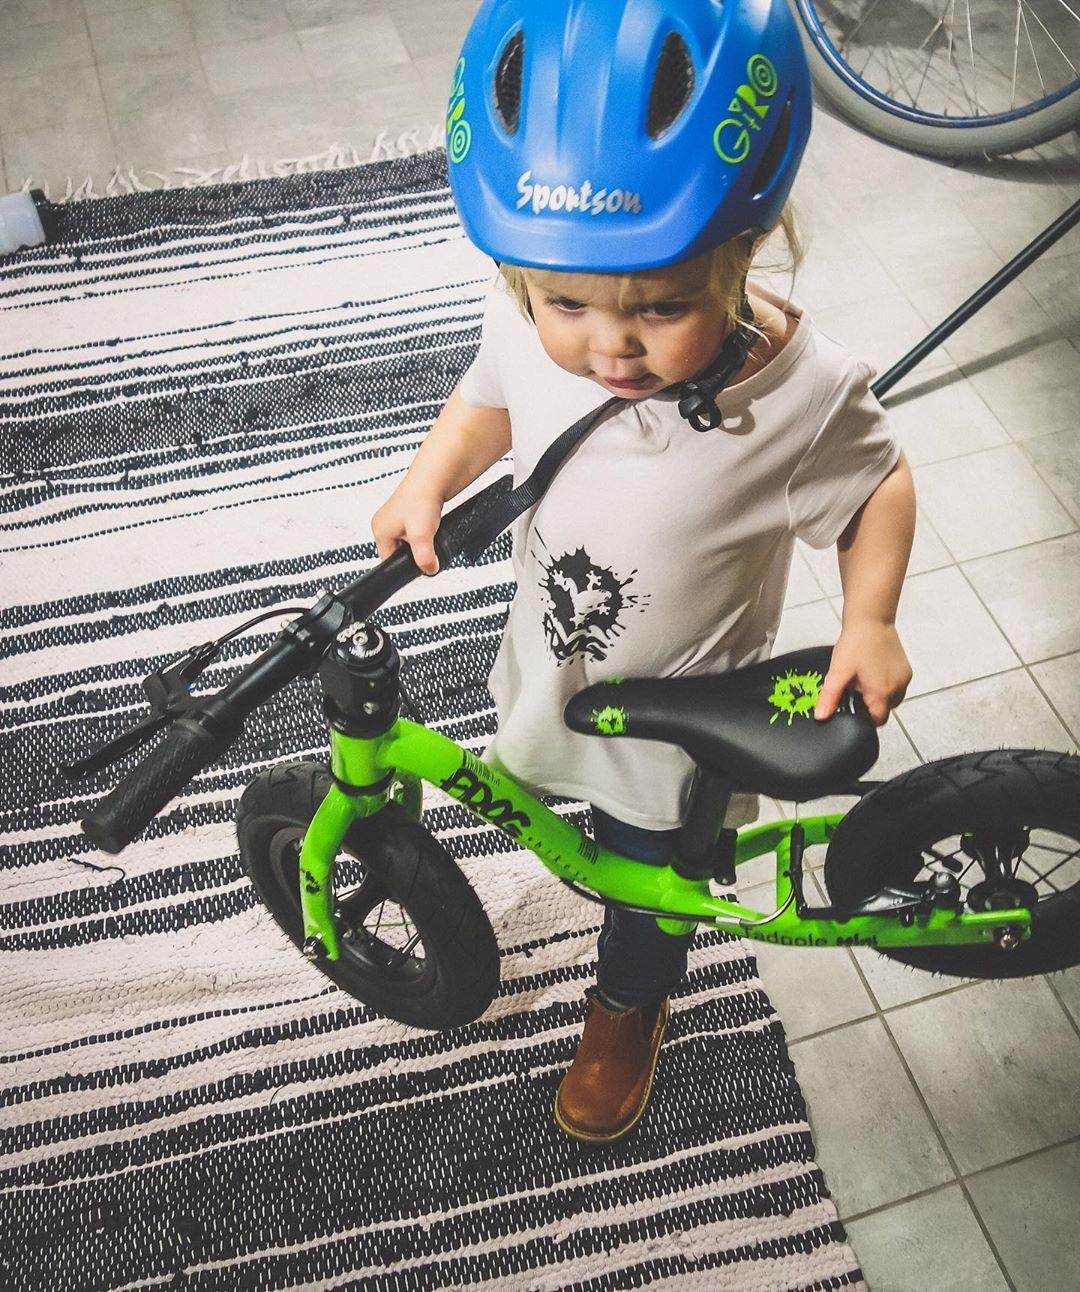 Instagram@elnadahlstrand Swedish Frog Bikes Ambassador Lovis carrying her green Frog Tadpole balance bike